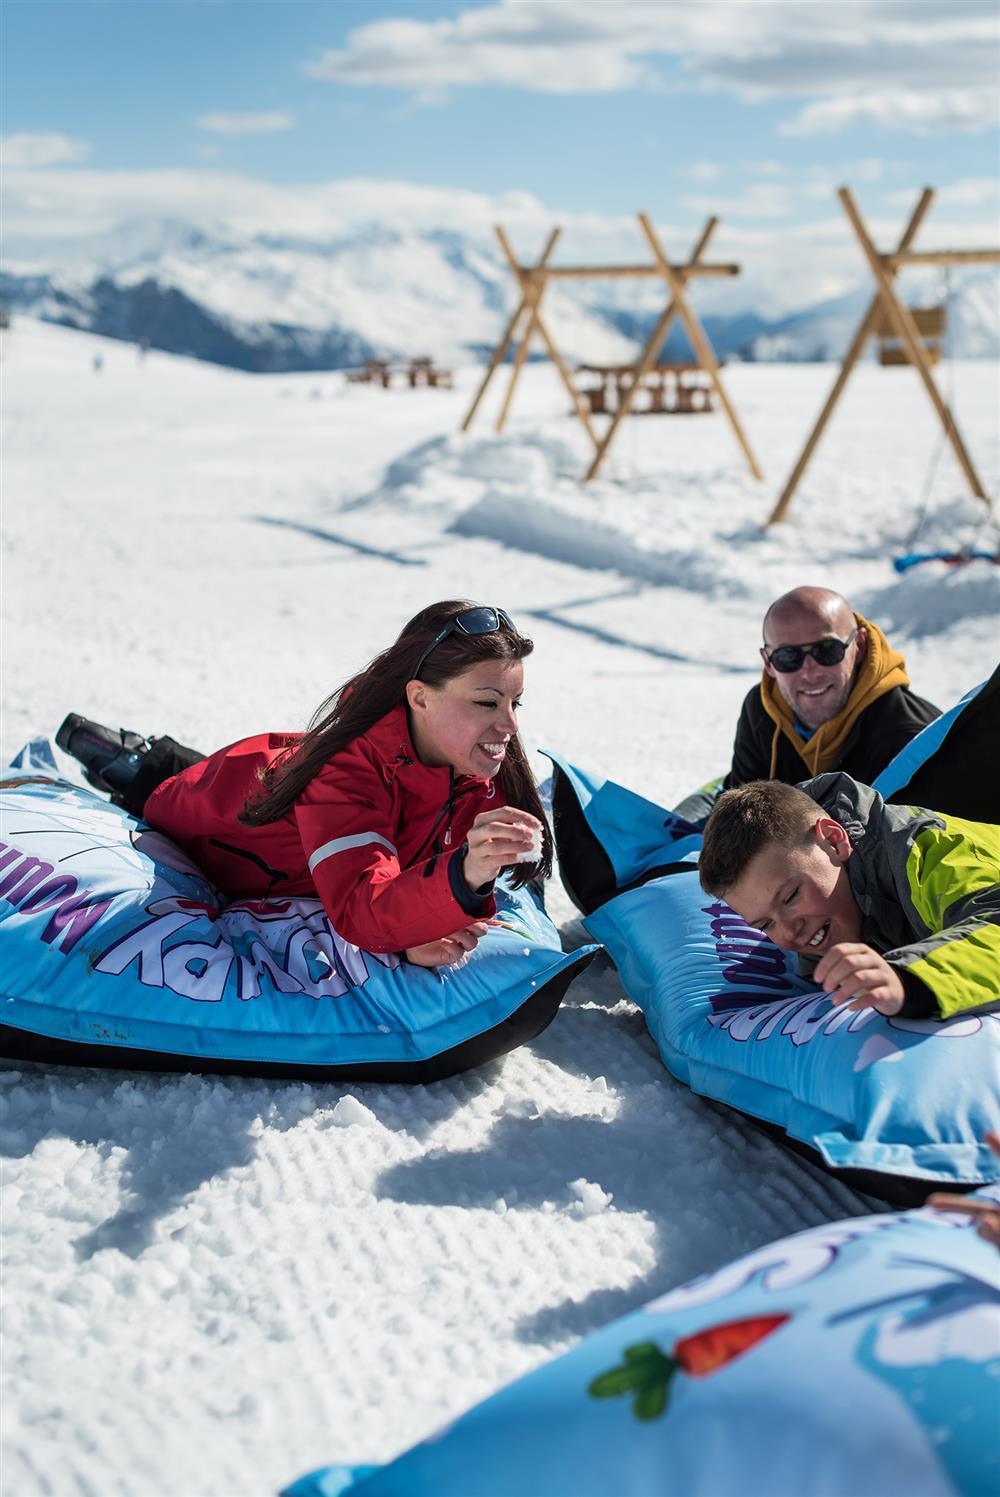 Relaxation sir big bag @snowpyMountain @LaToussuire © Alban Pernet